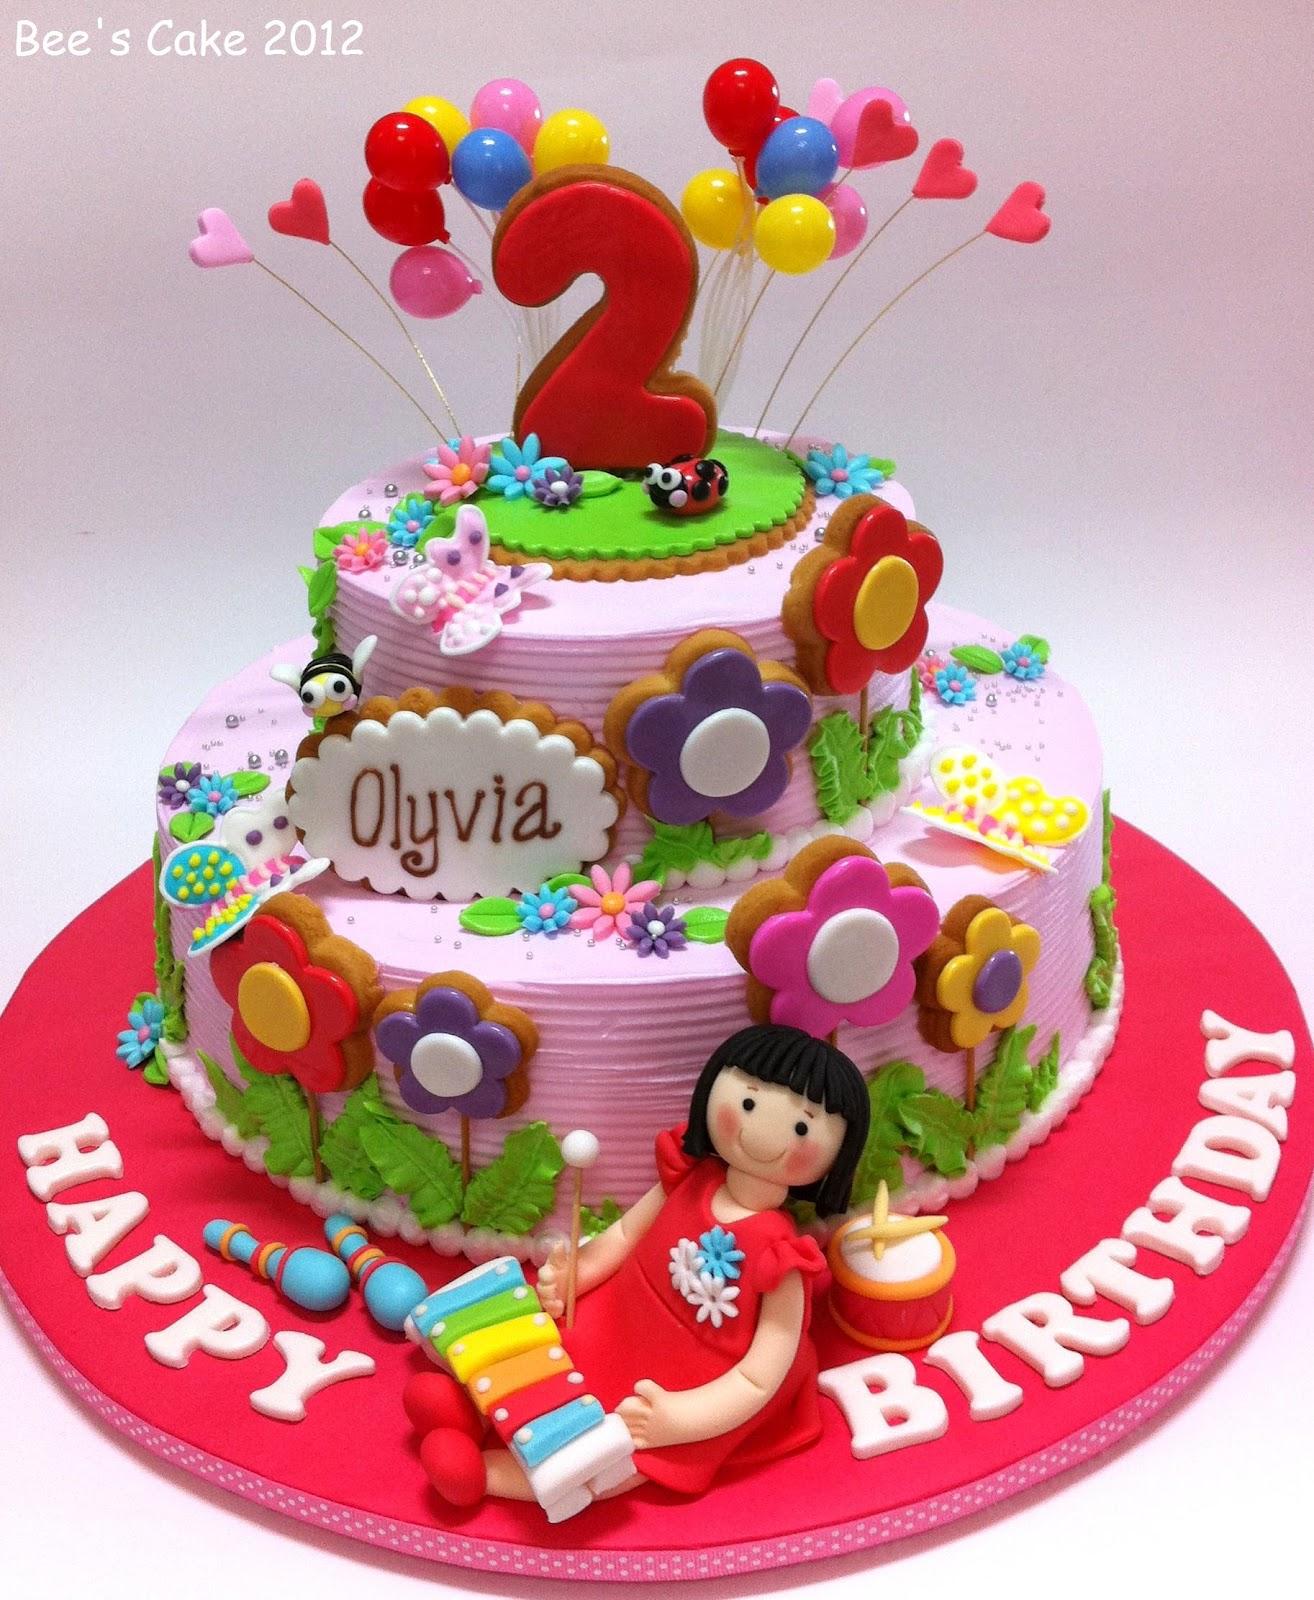 2nd Birthday Cake Designs For Baby Girl : Bee s Cake: Olyvia s 2nd Birthday